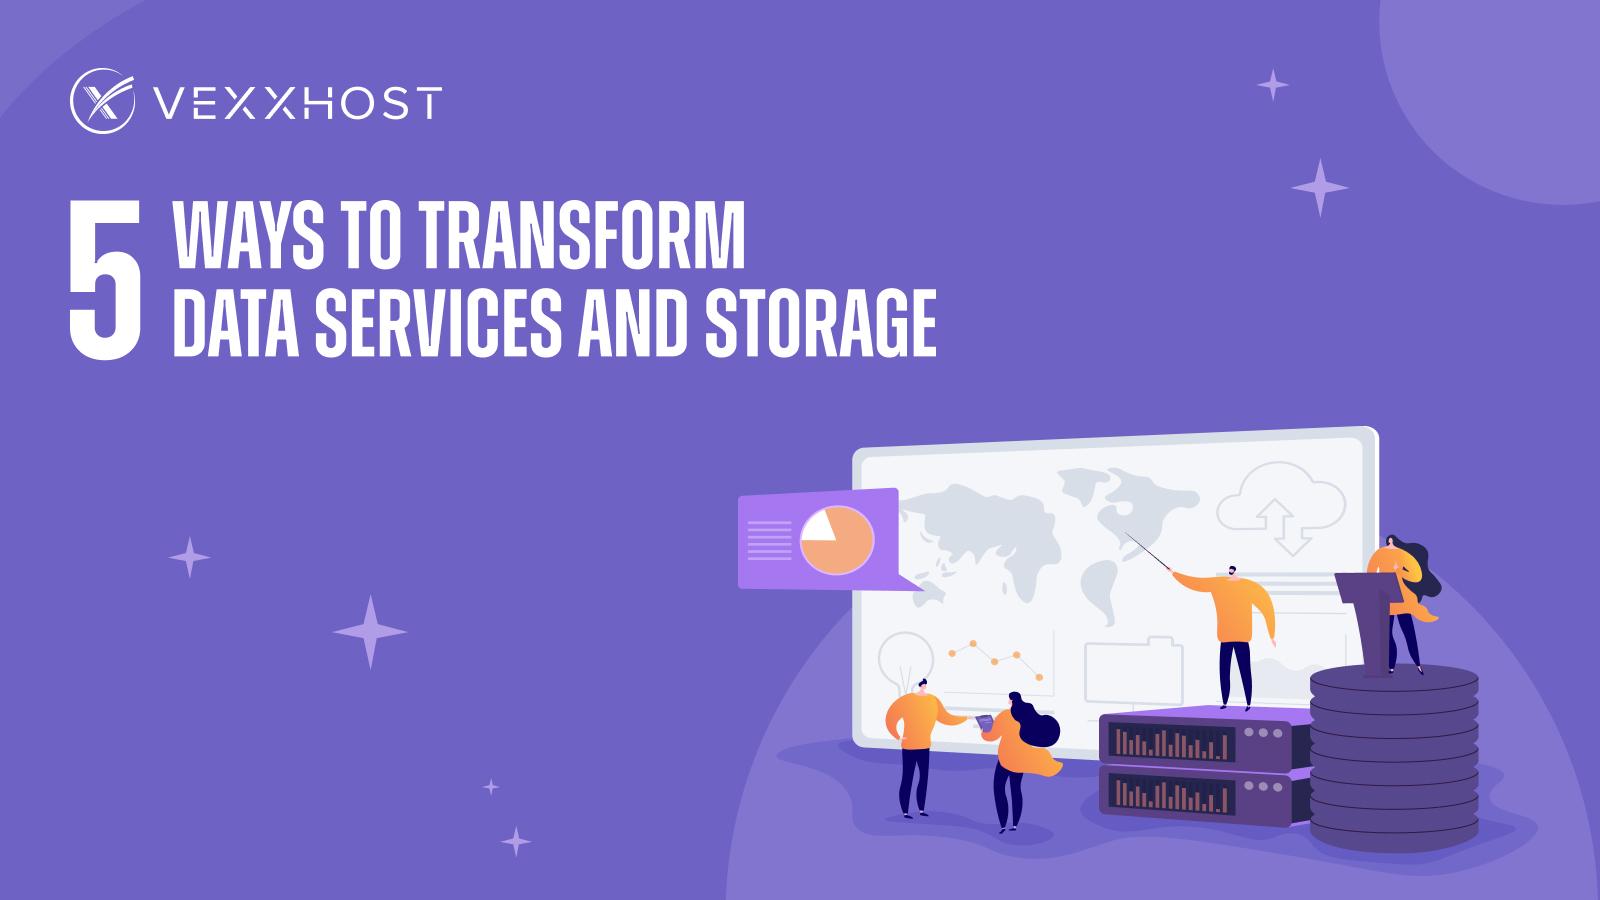 5 Ways to Transform Data Services and Storage